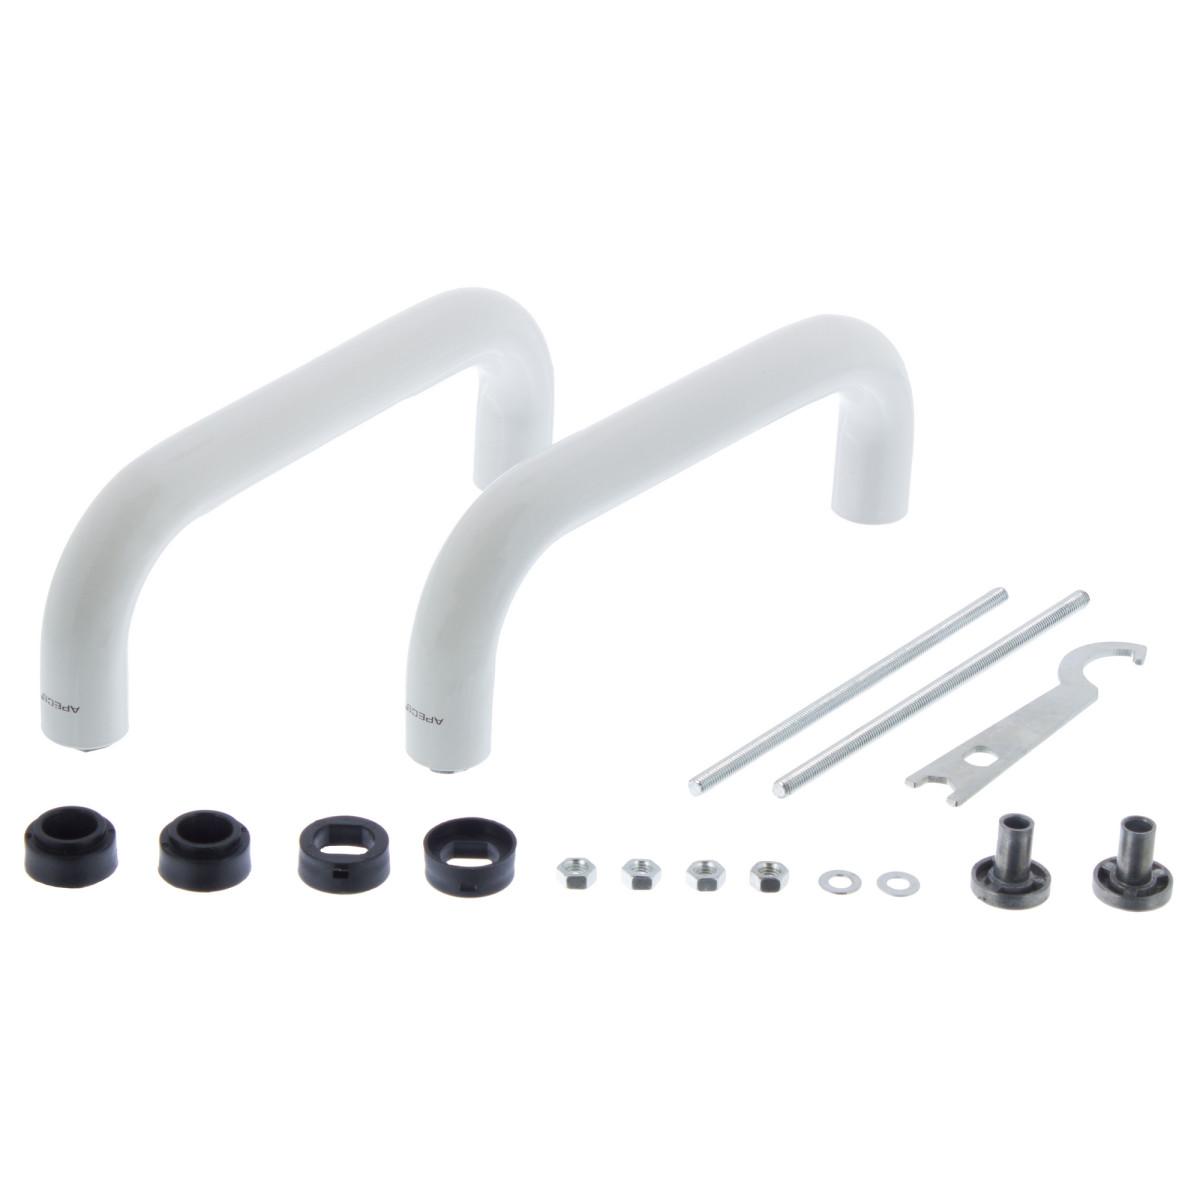 Ручка-Скоба Дверная Hc-0920-25/300-Inox Цвет Глянцевый Хром